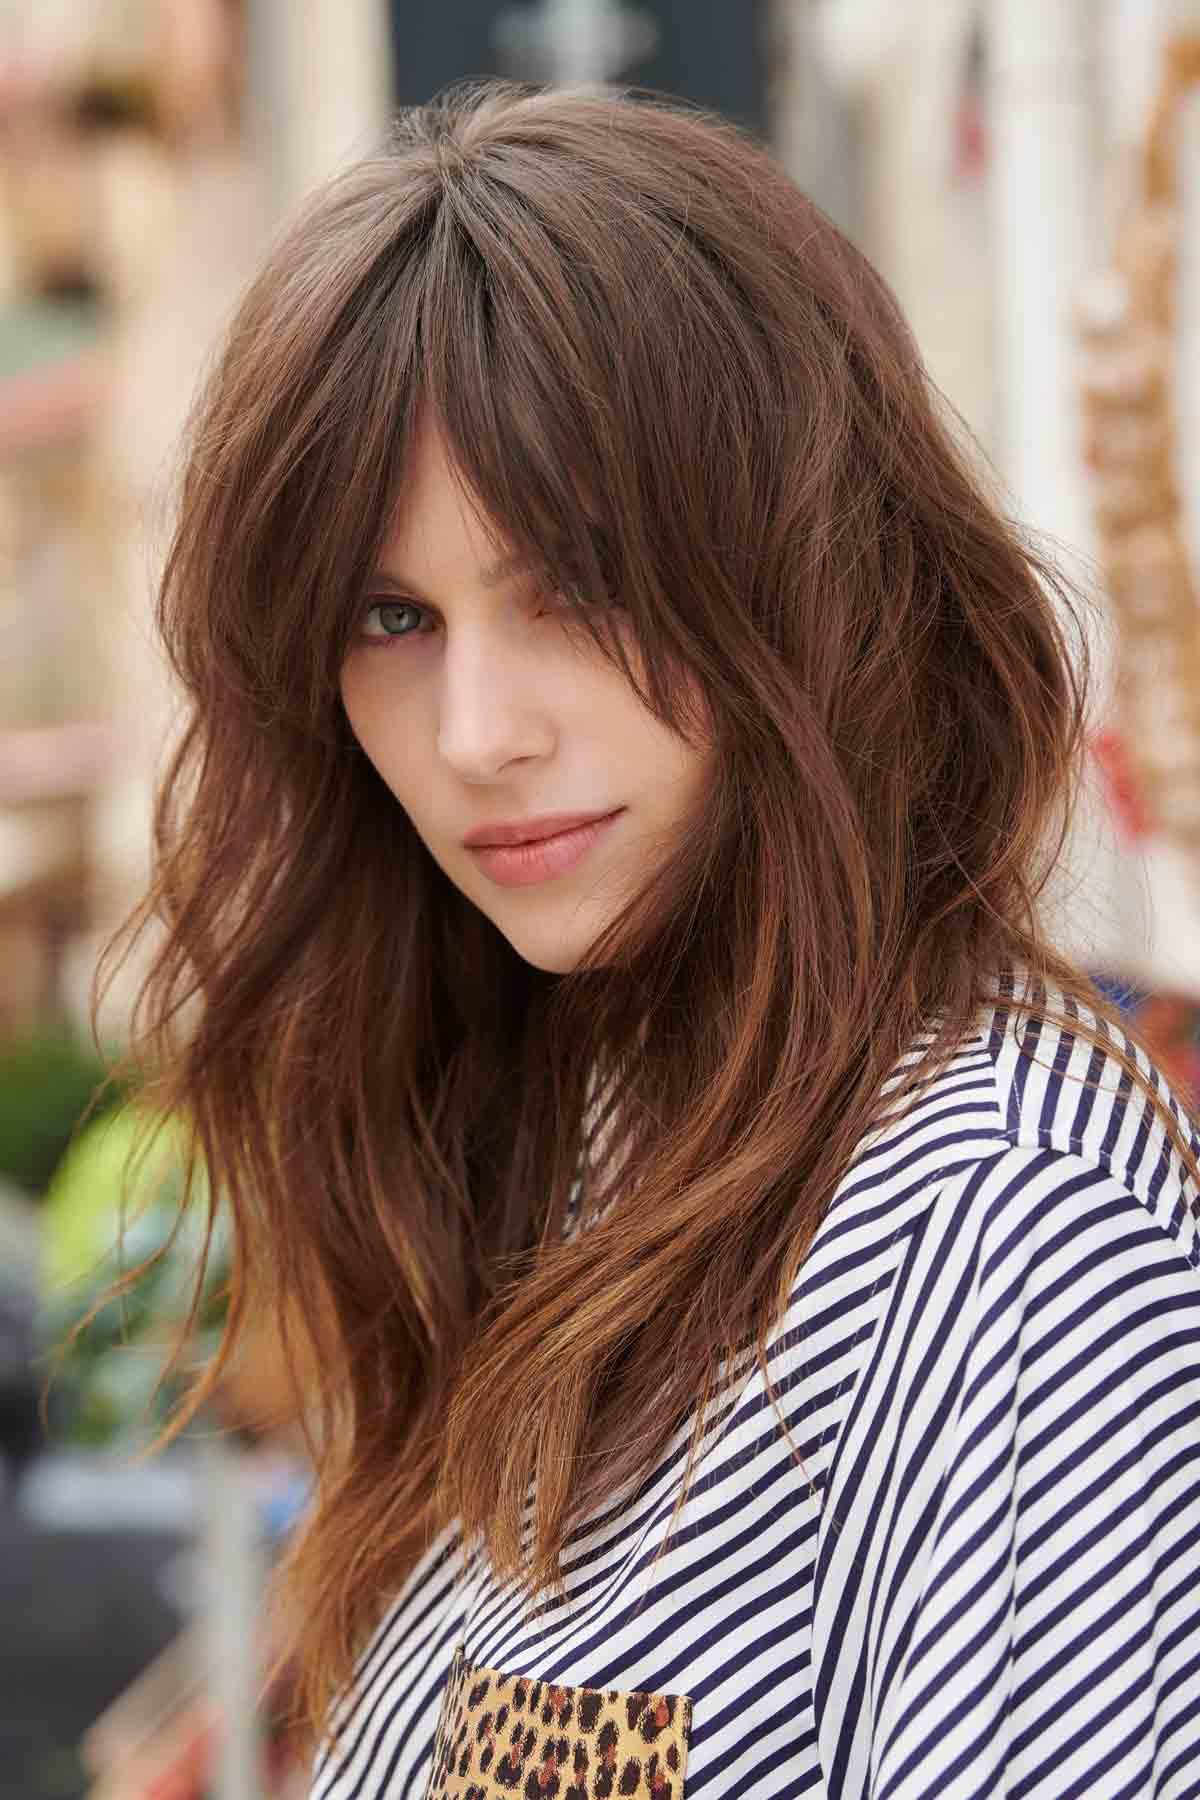 Great Lengths Hair Image